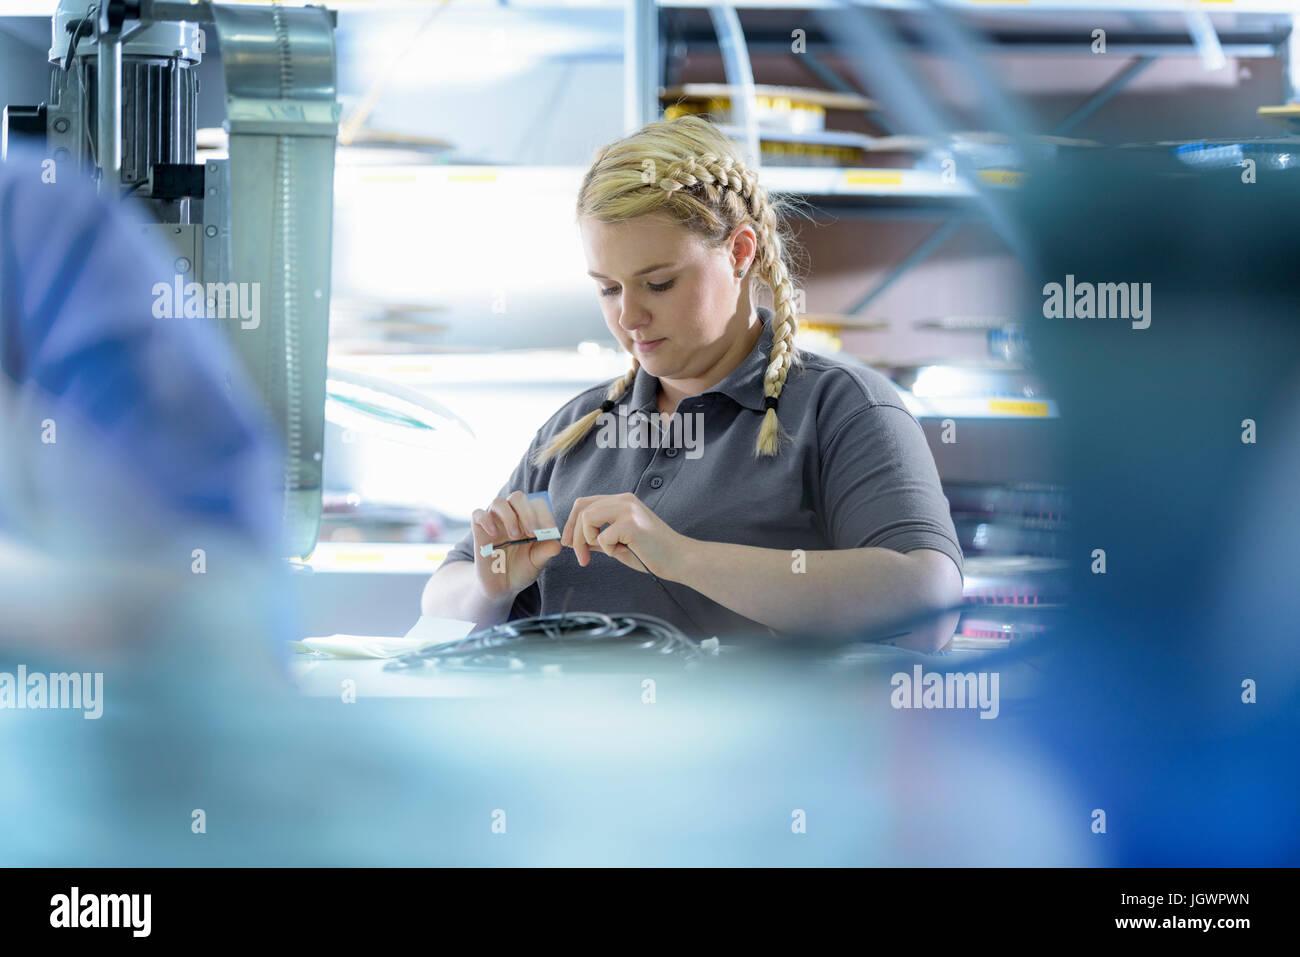 Weiblichen Lehrling Elektroingenieure Kabel Abschluss Fabrik Stockbild